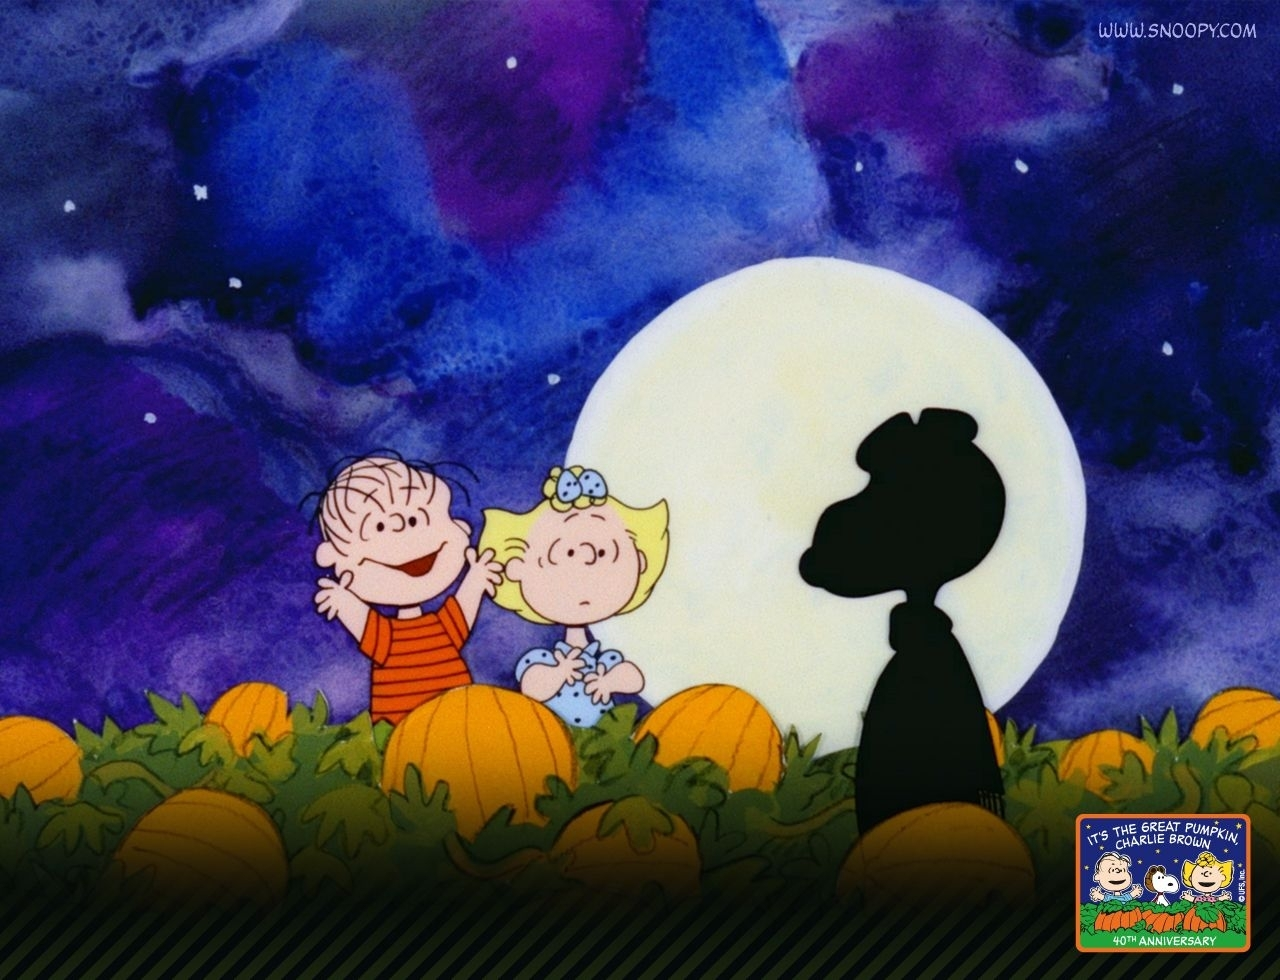 peanuts halloween wallpaper | snoopy desktops / free movie